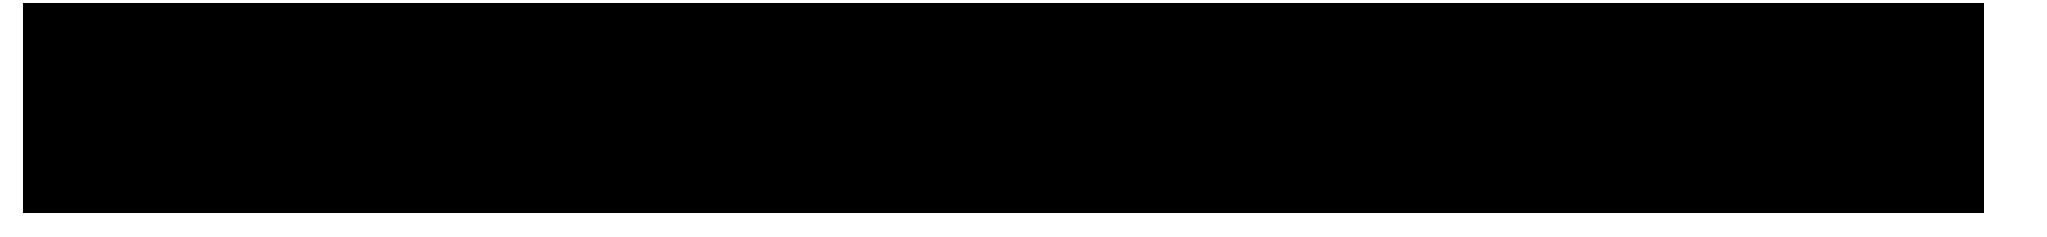 BLACKOPE